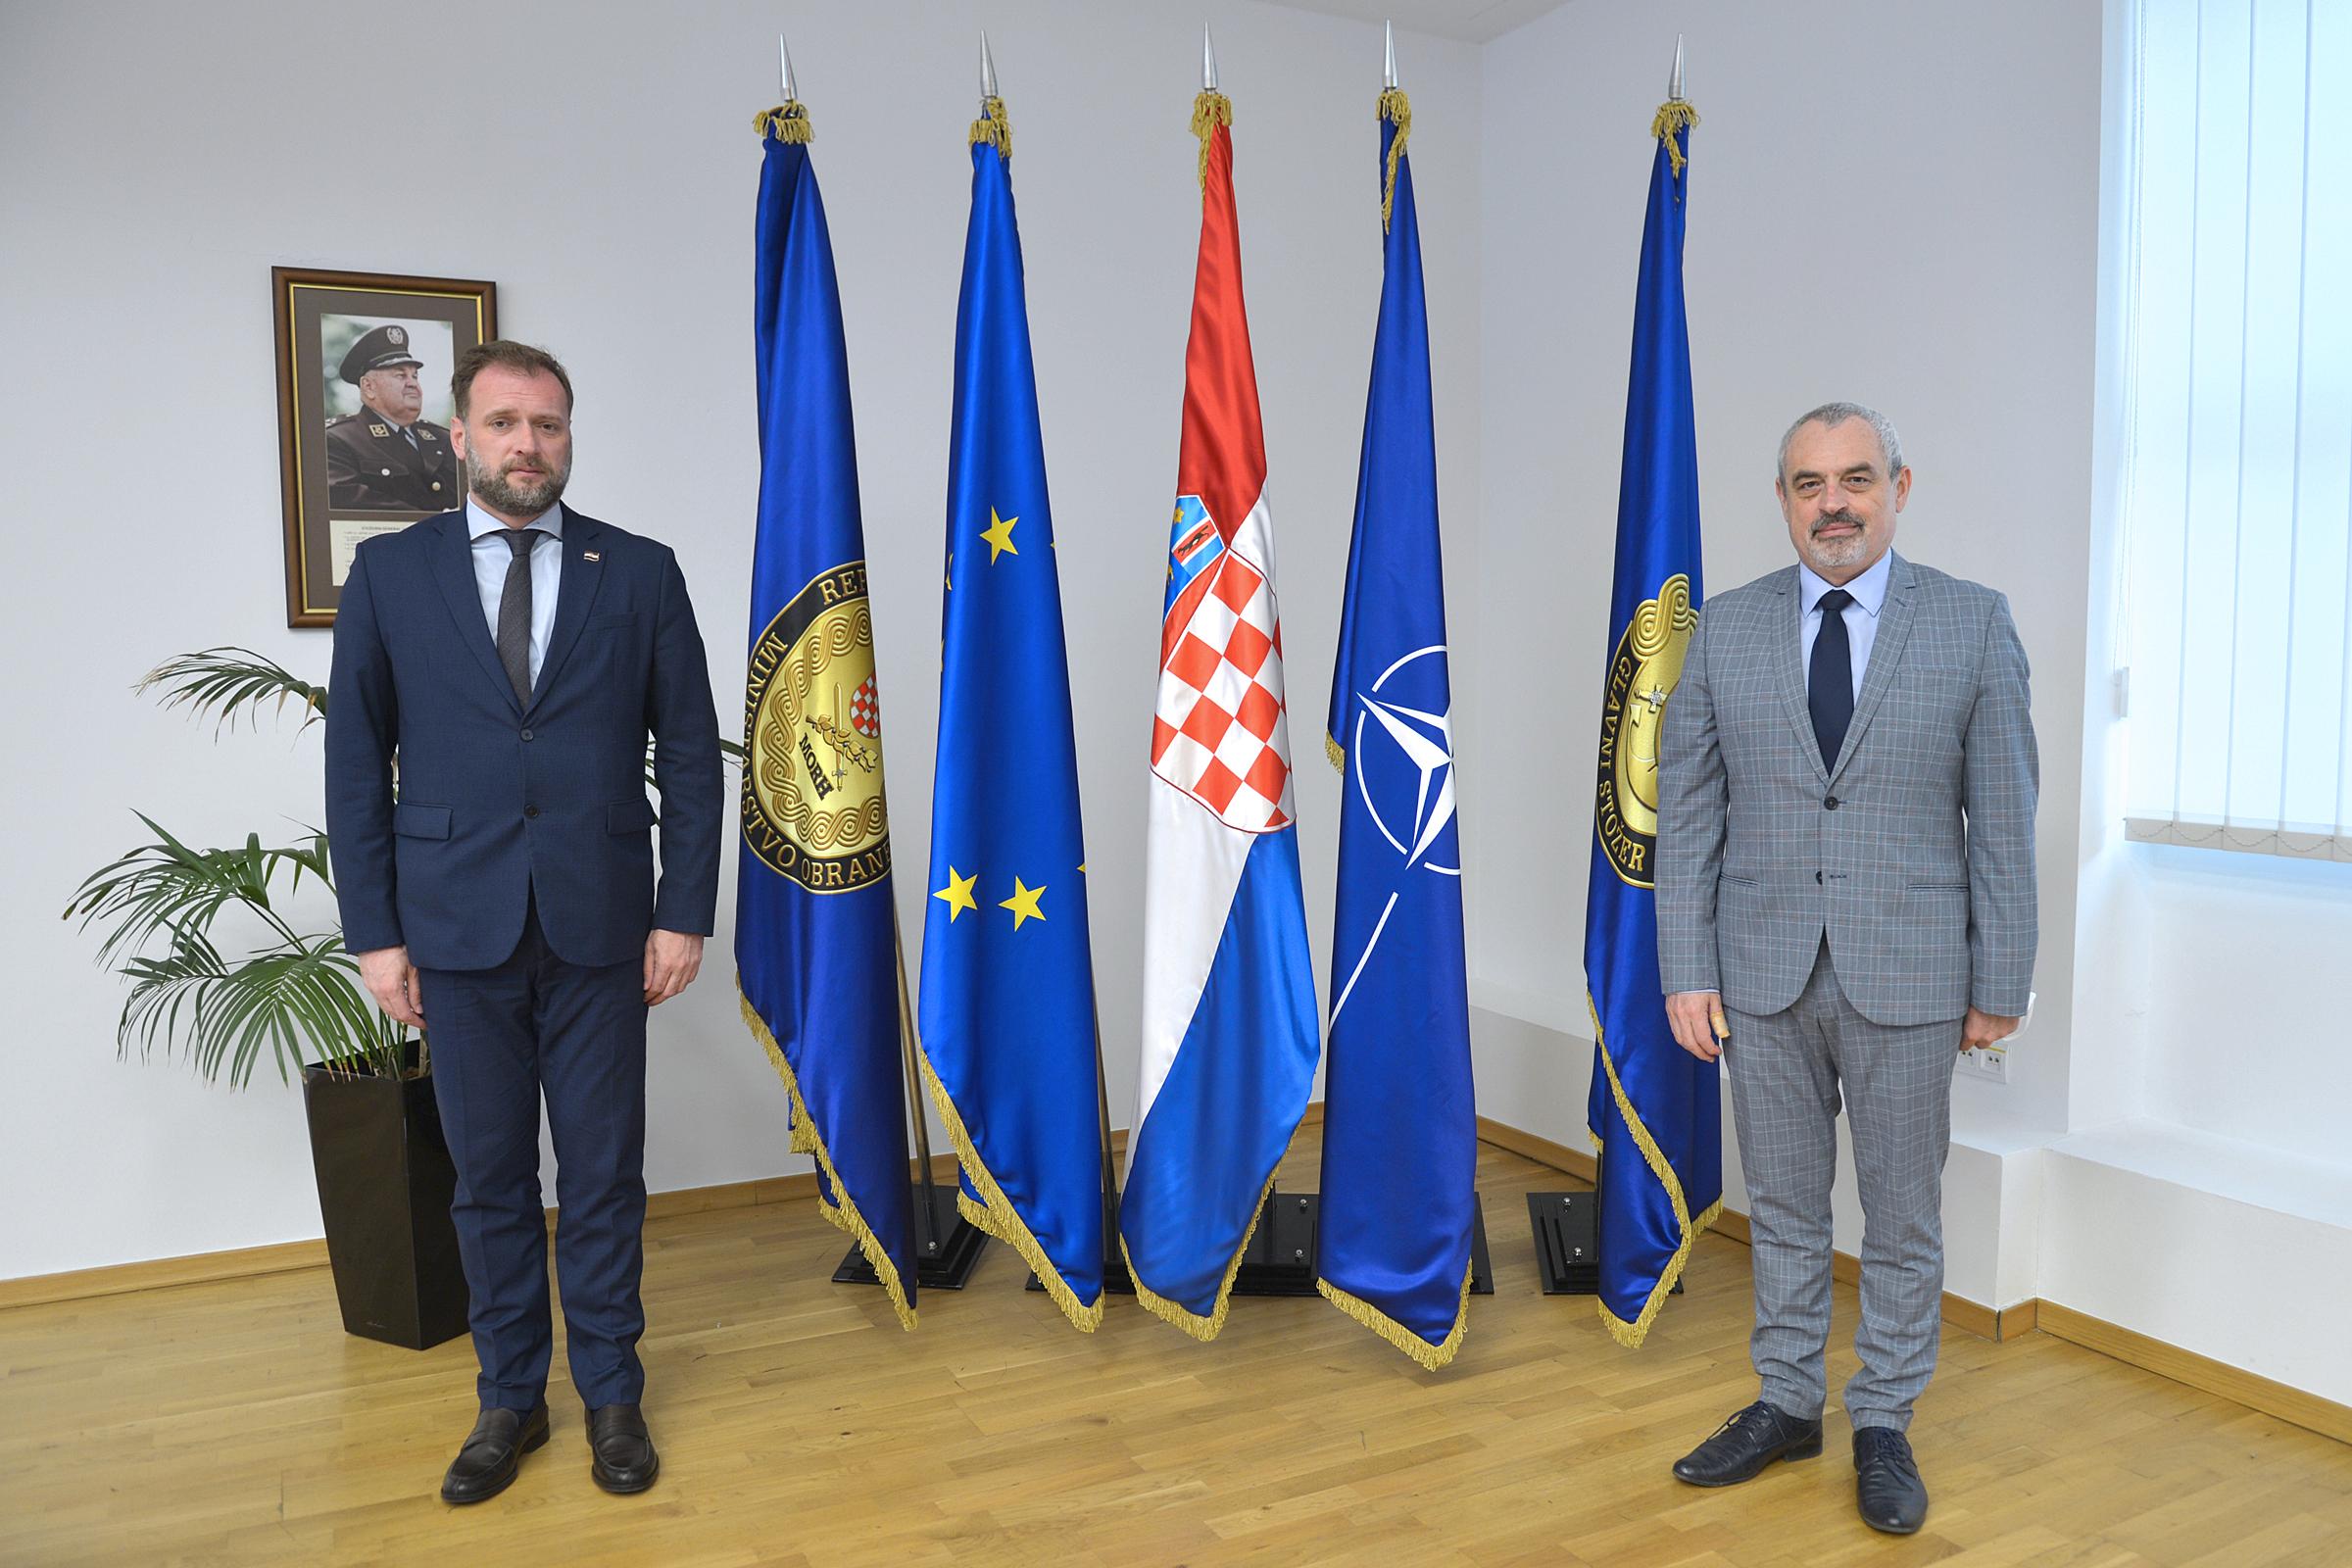 Ministar Banožić s veleposlanikom Slovačke Republike Suskom